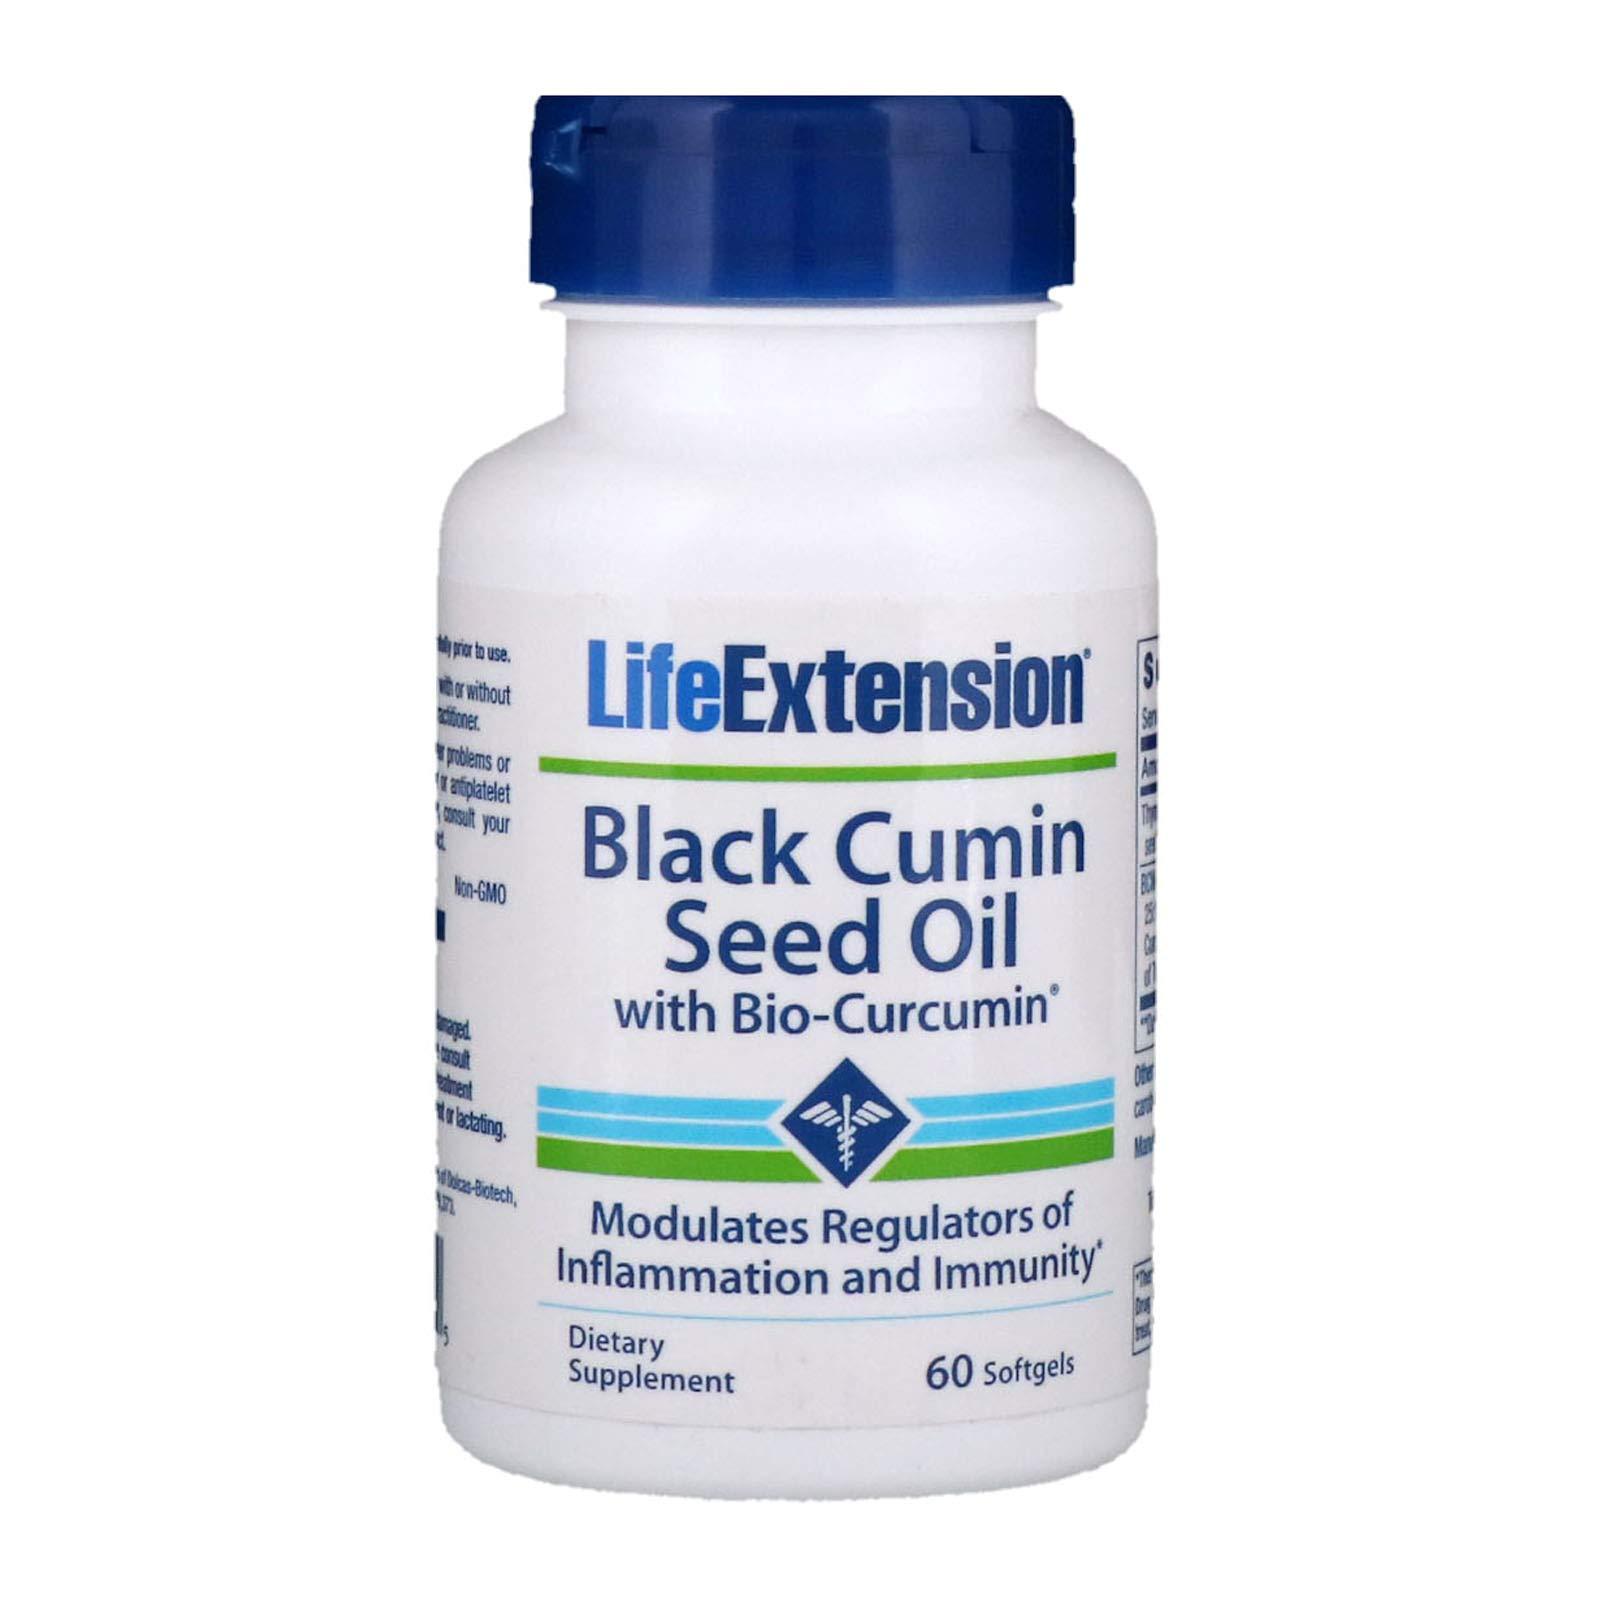 Black Cumin Seed Oil with Bio-Curcumin 60 softgels-Pack-3